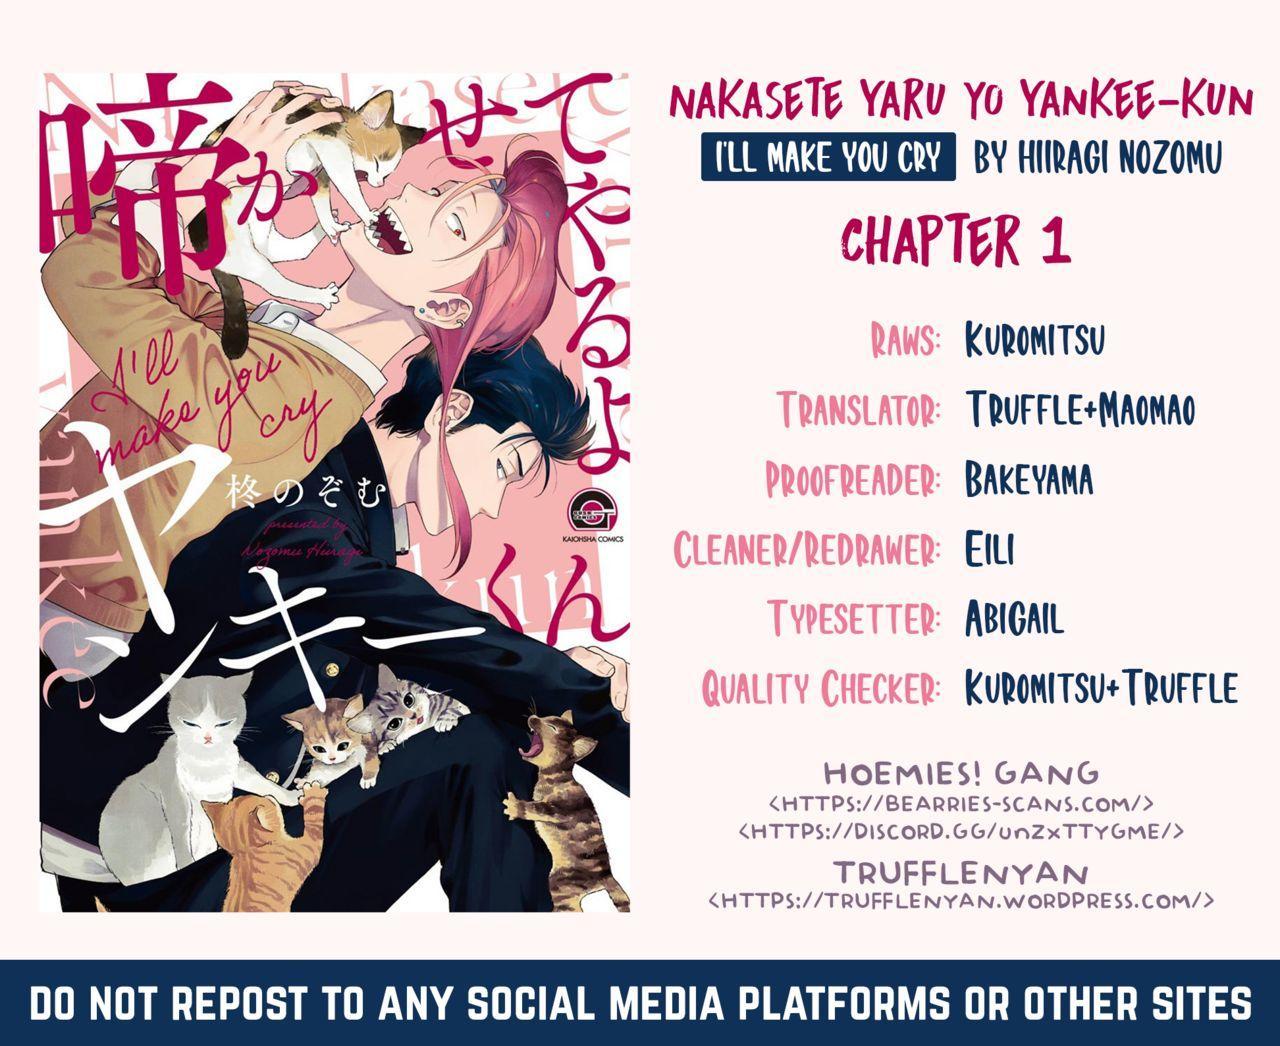 [Hiiragi Nozomu] Nakasete Yaru yo Yankee-kun   I'll Make You Cry Ch. 1-5 + Extras [English] [Digital] 2